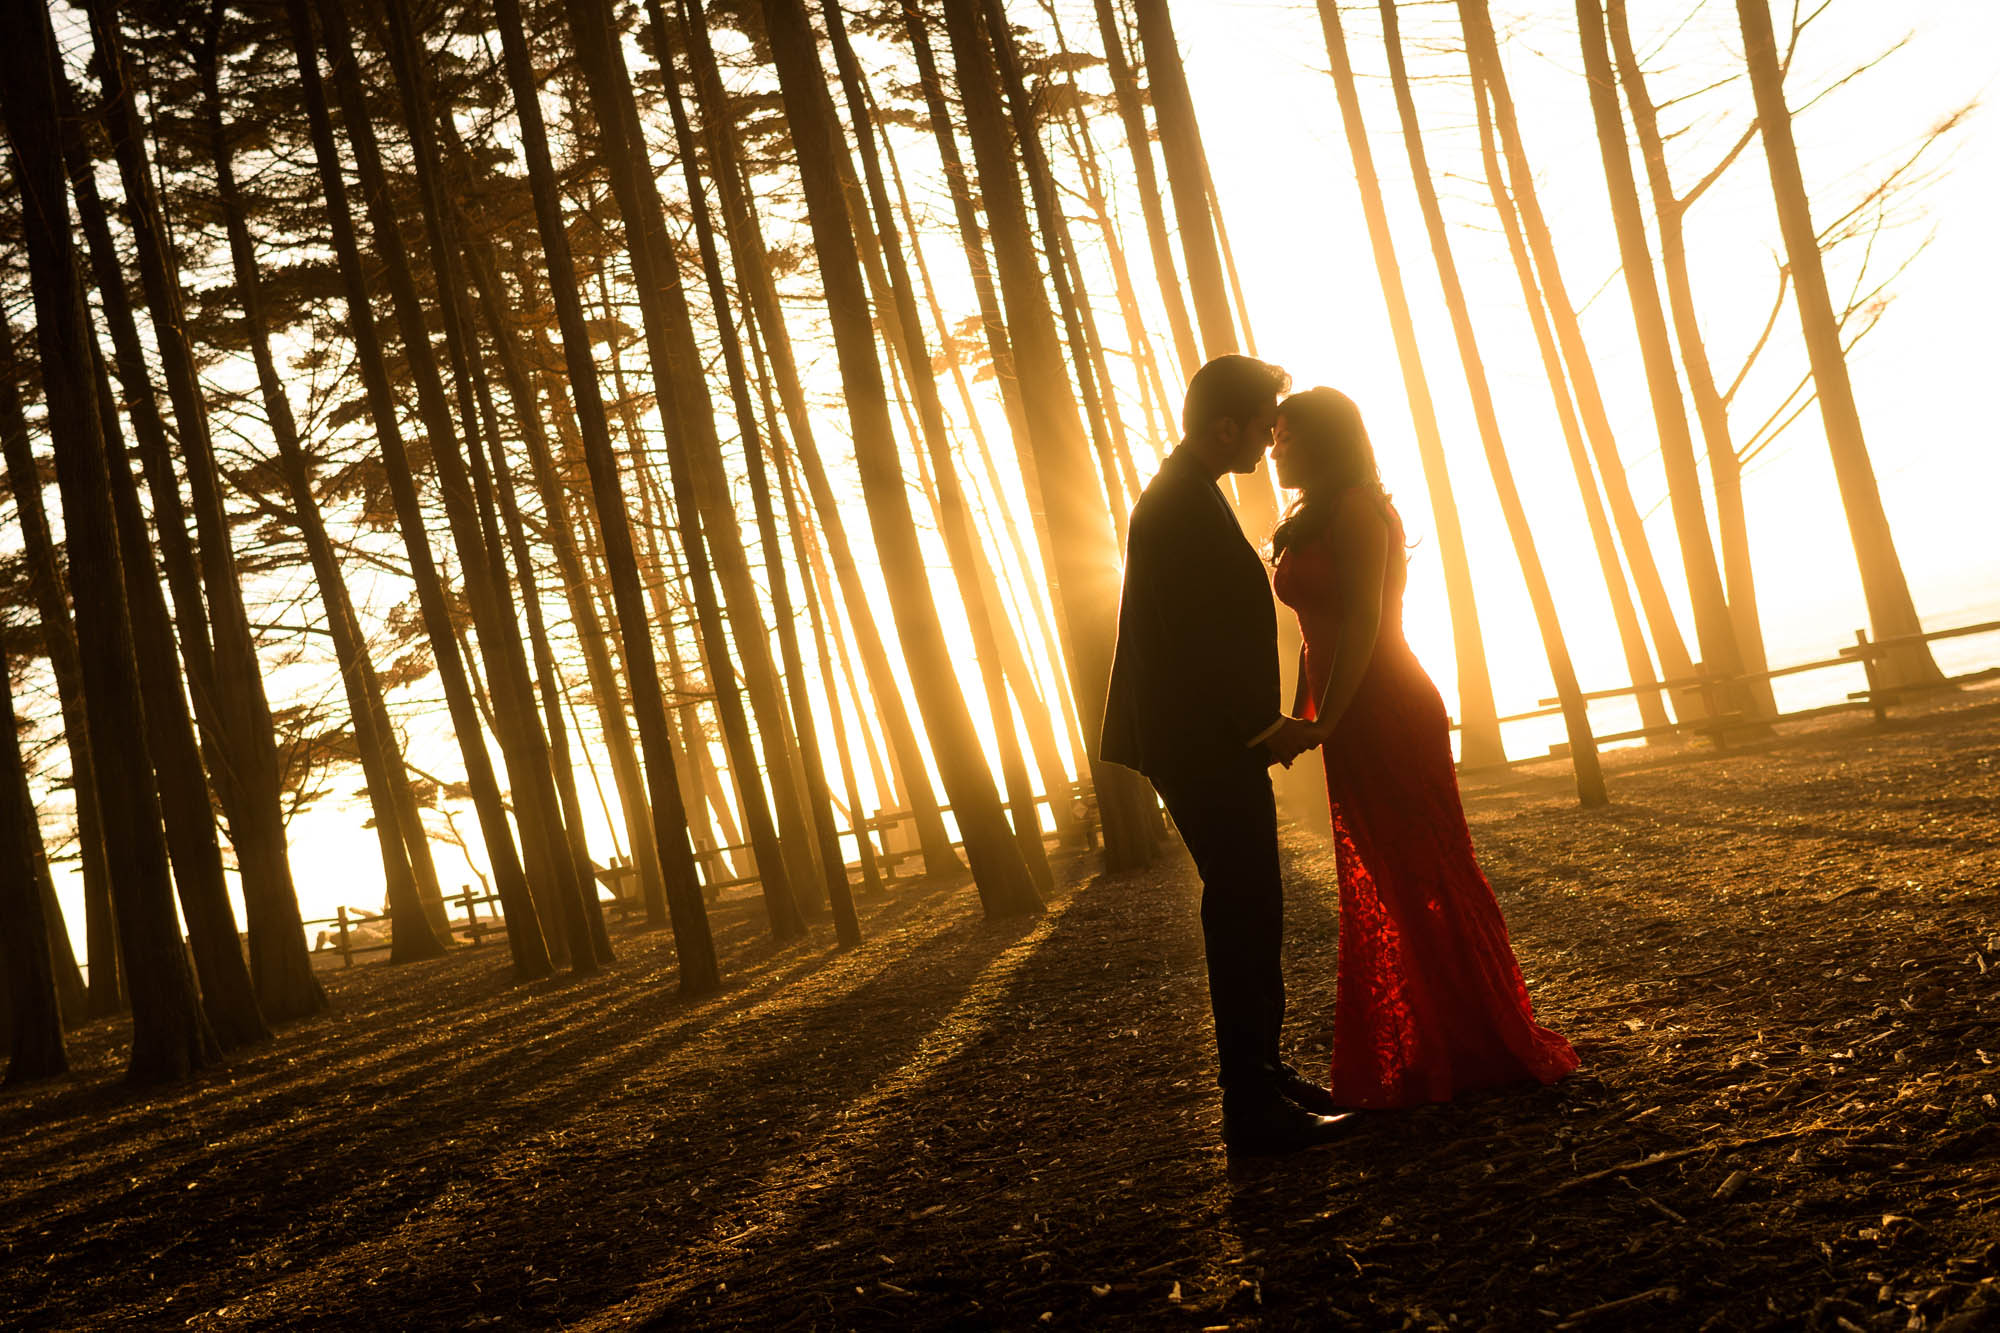 5997_Garima_and_Sushant_Fitzgerald_Marine_Reserve_Moss_Beach_Engagement_Photography.jpg